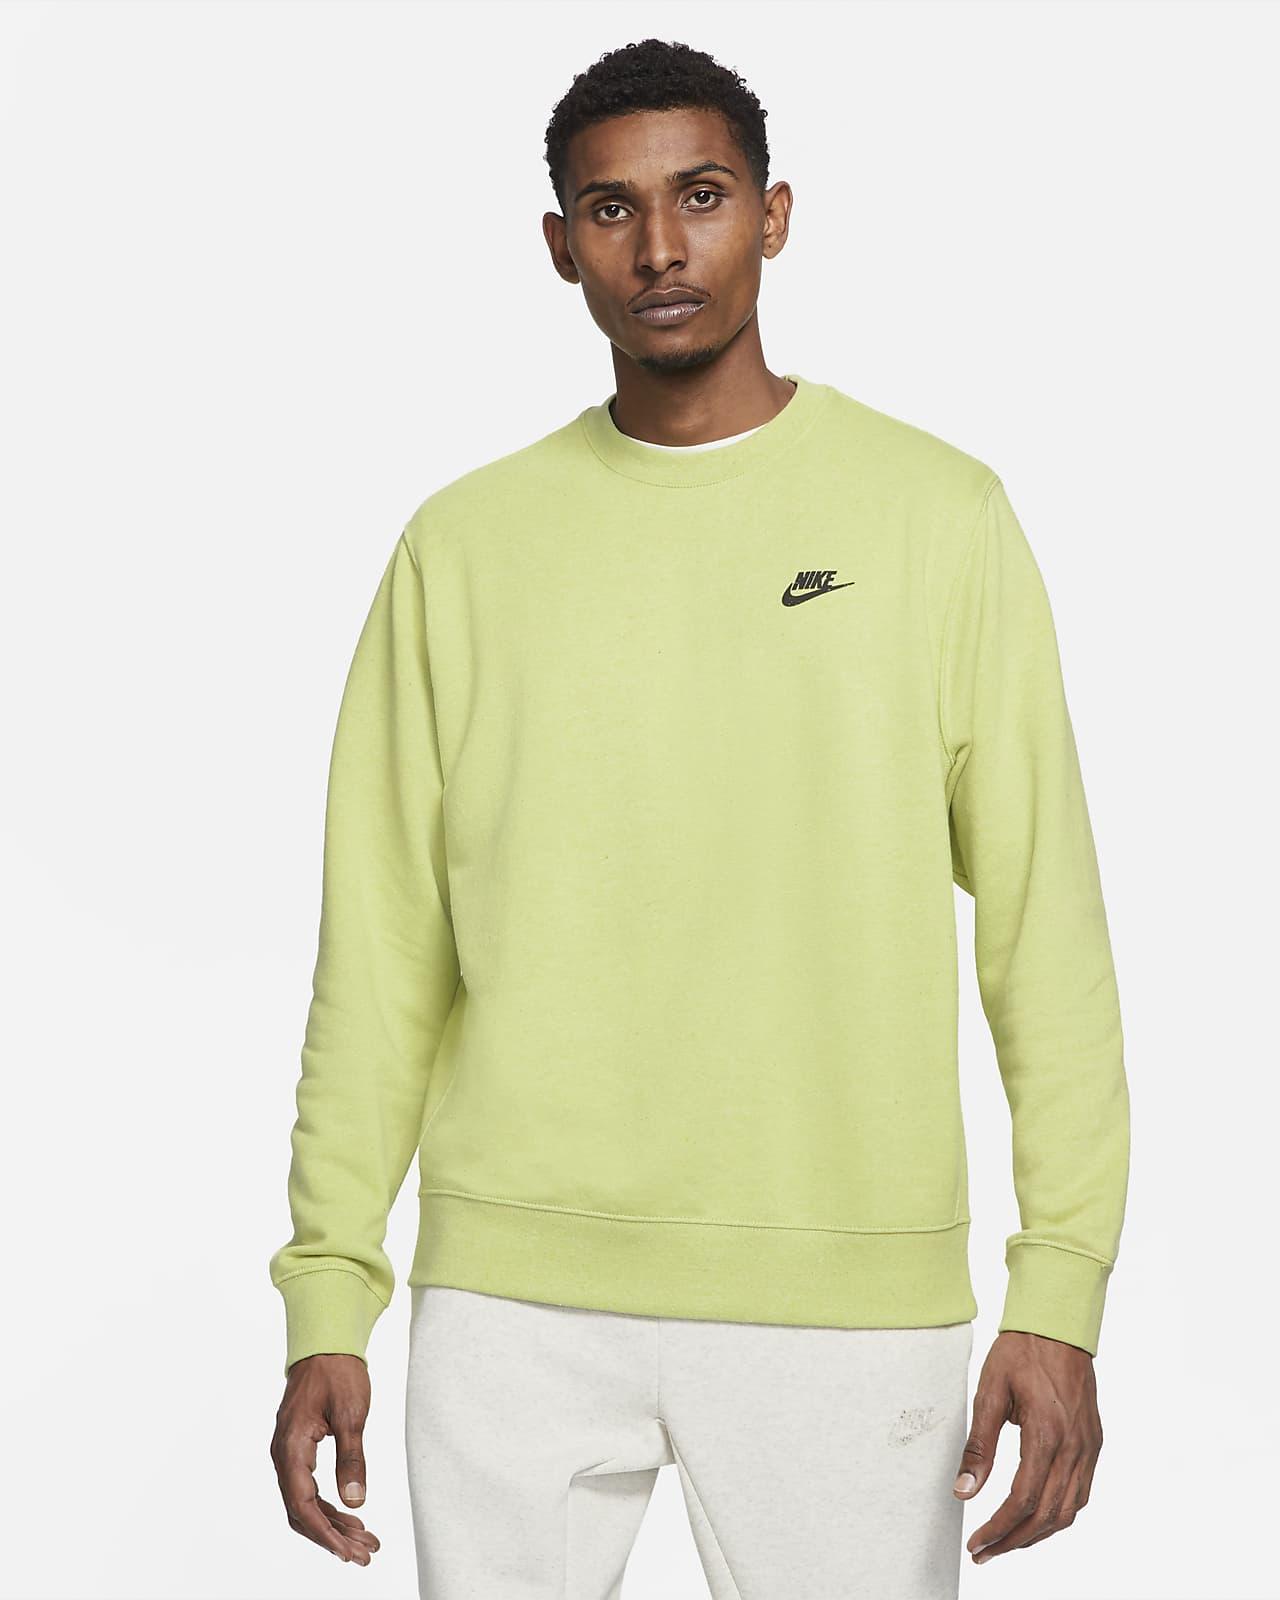 Nike Sportswear Dessuadora - Home